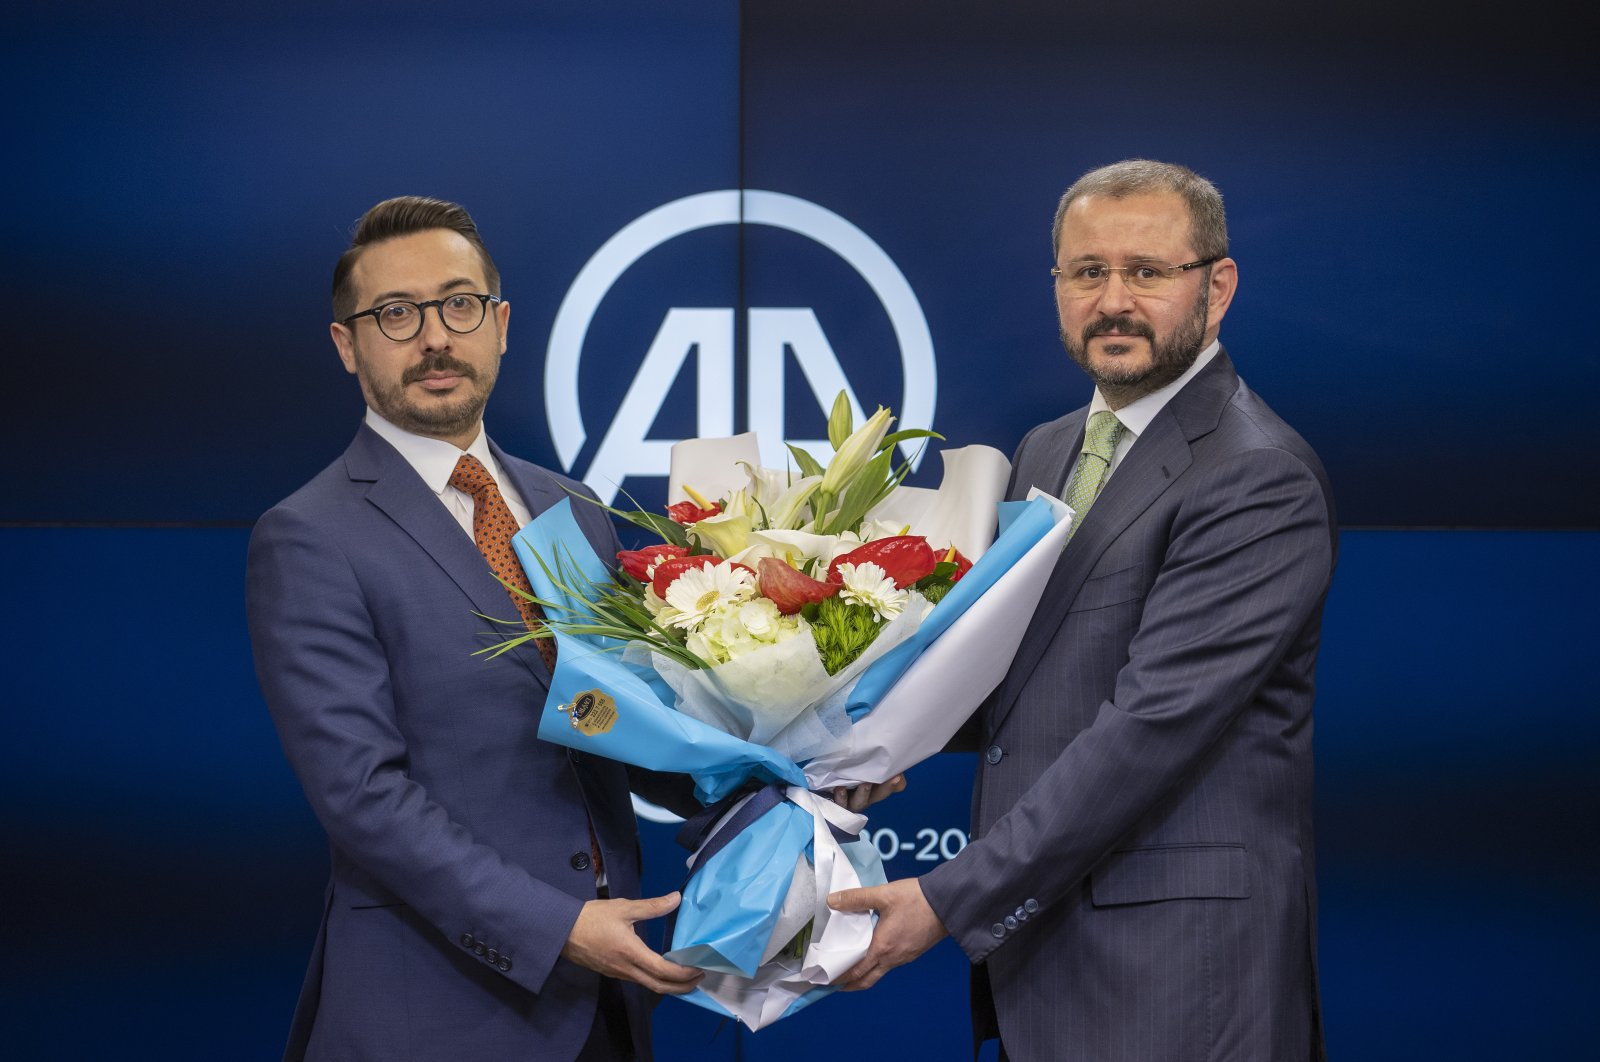 Serdar Karagöz (L) poses with his predecessor Şenol Kazancı at a handover ceremony, in the capital Ankara, Turkey, April 7, 2021. (AA PHOTO)